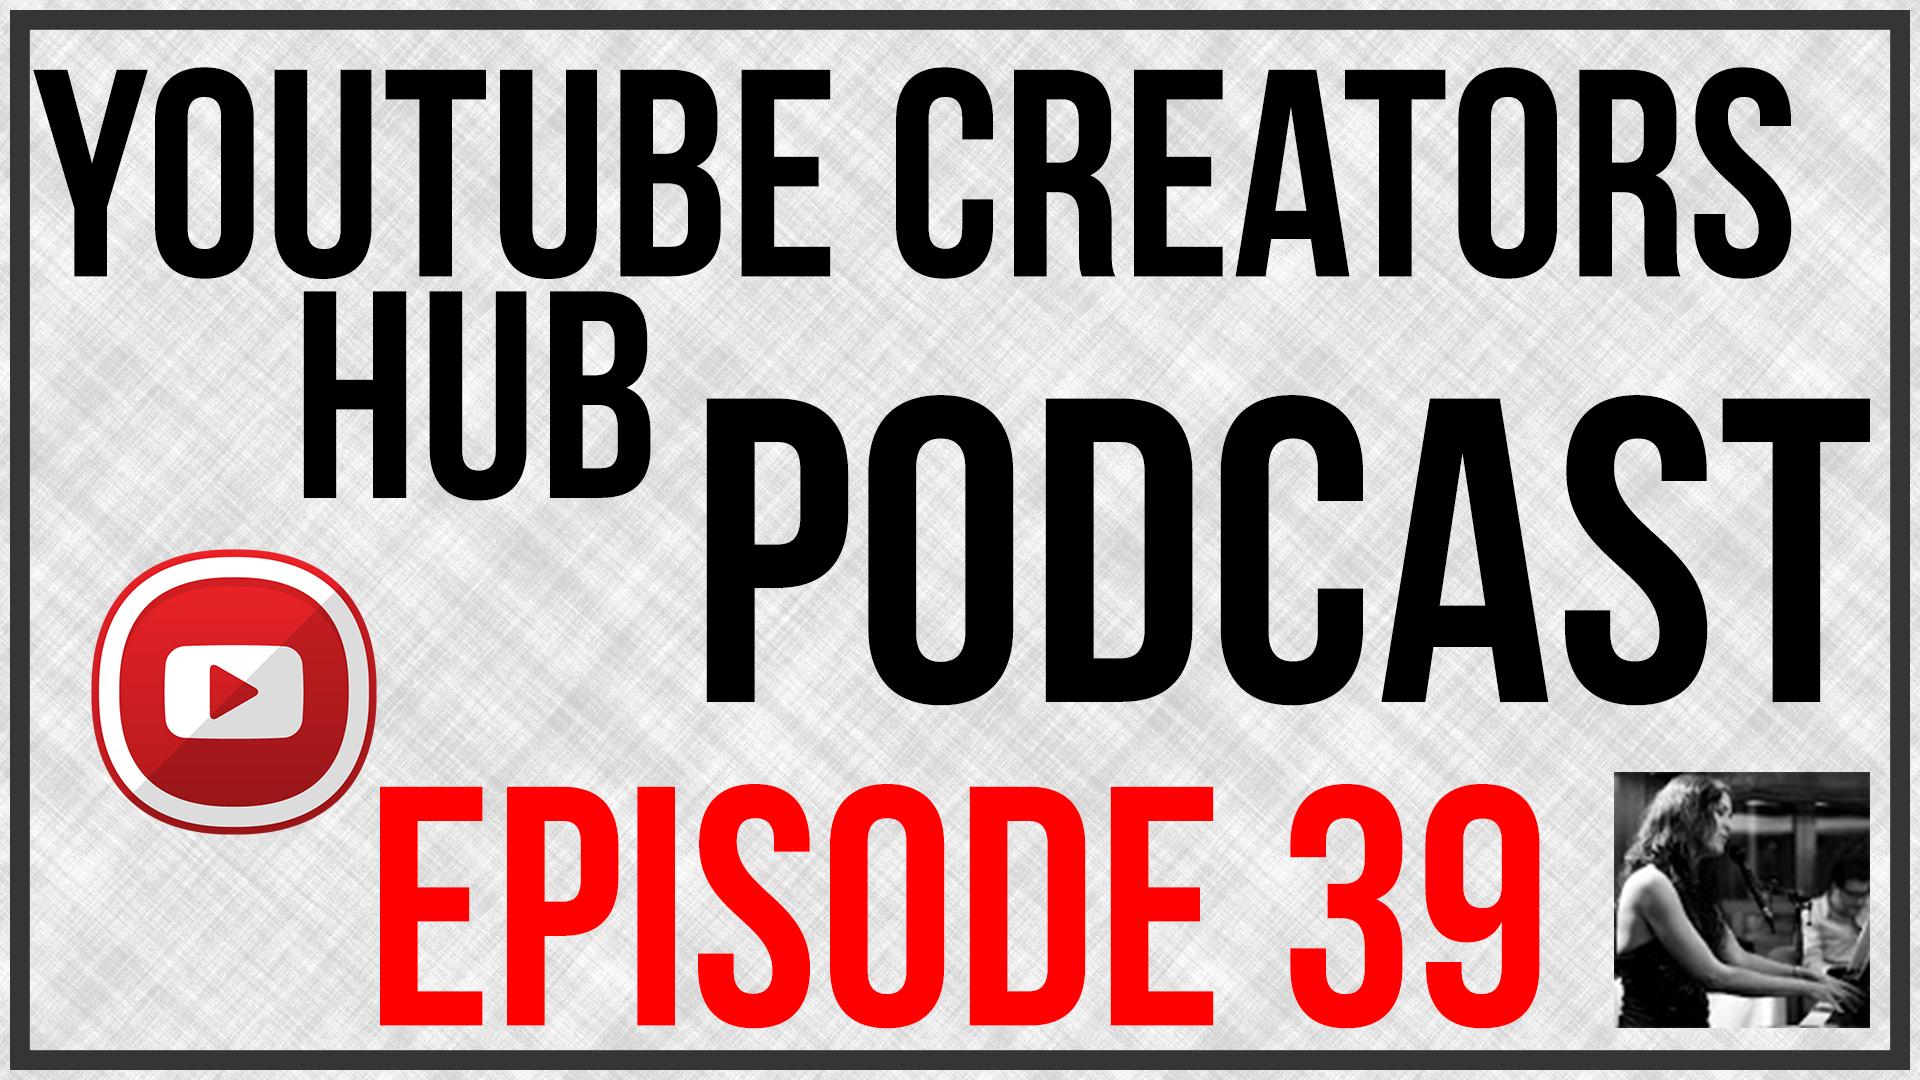 youtube creators hub podcast episode 39